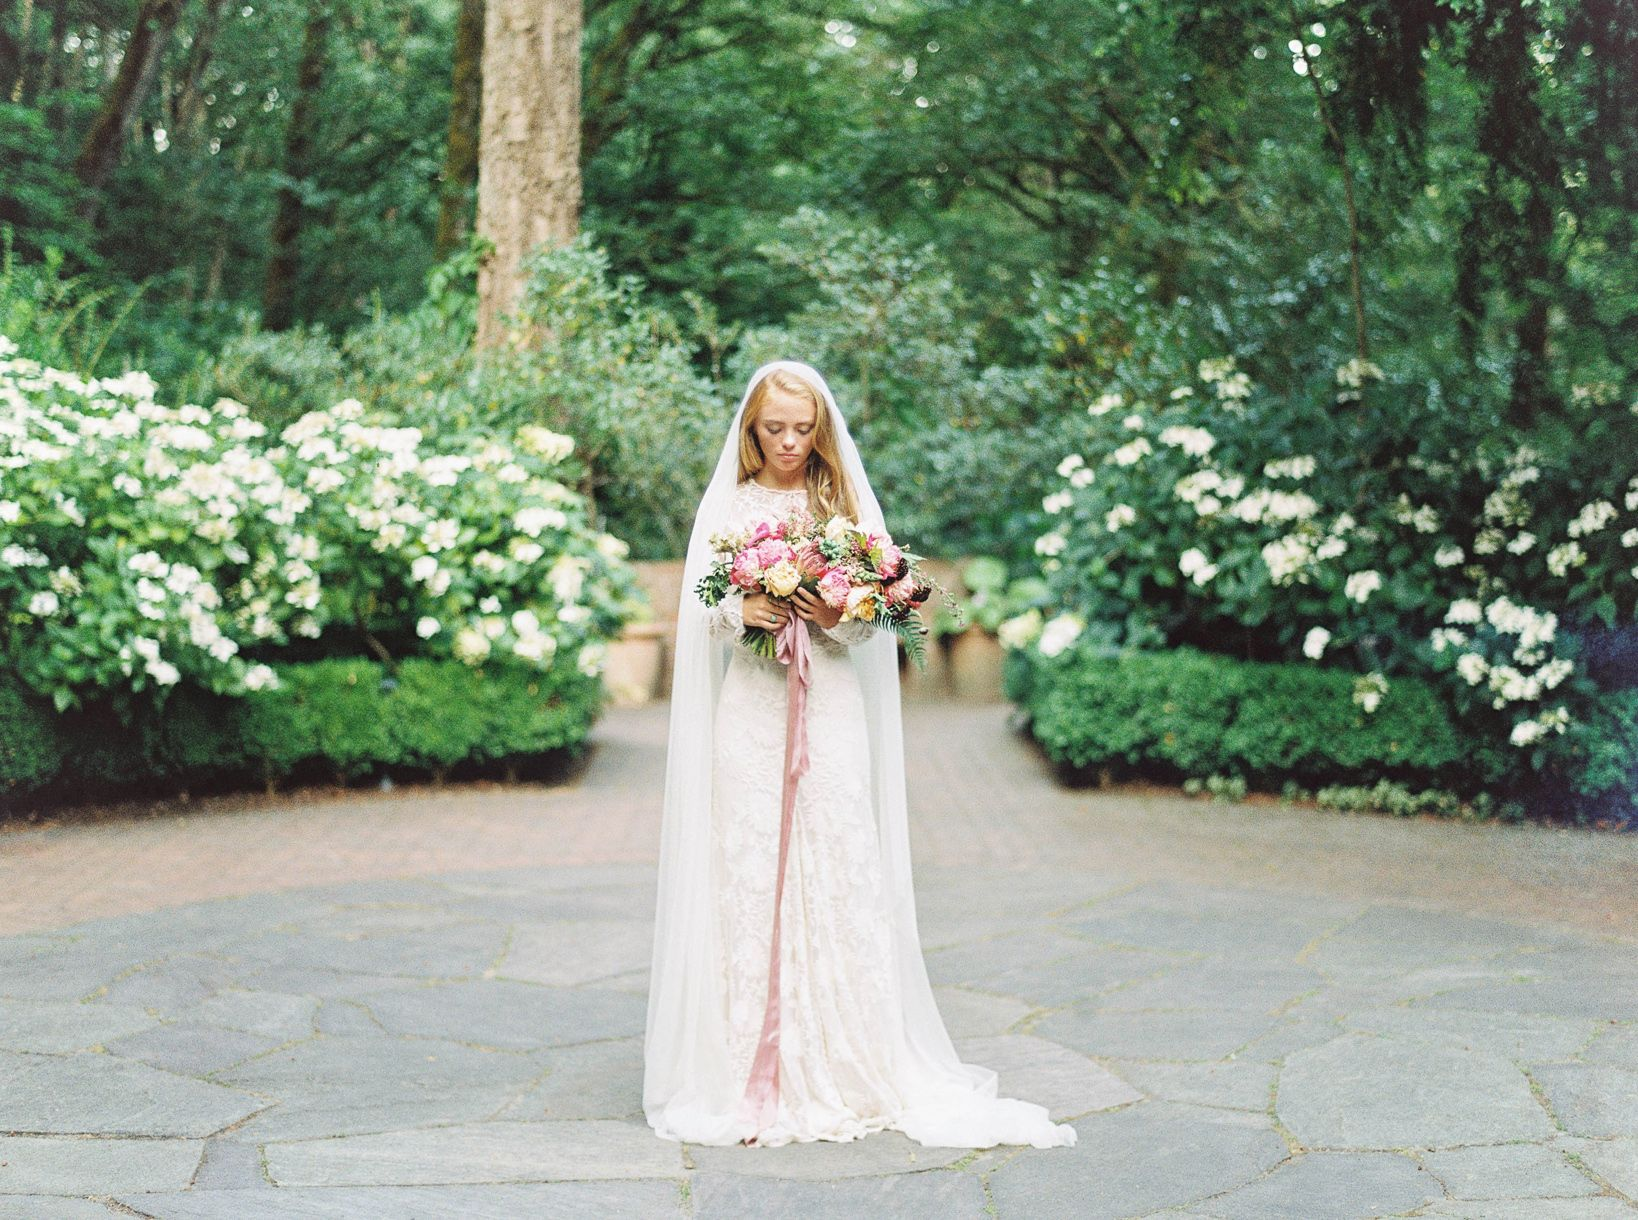 Pin by deanna als on wedding dresses pinterest wedding dress and